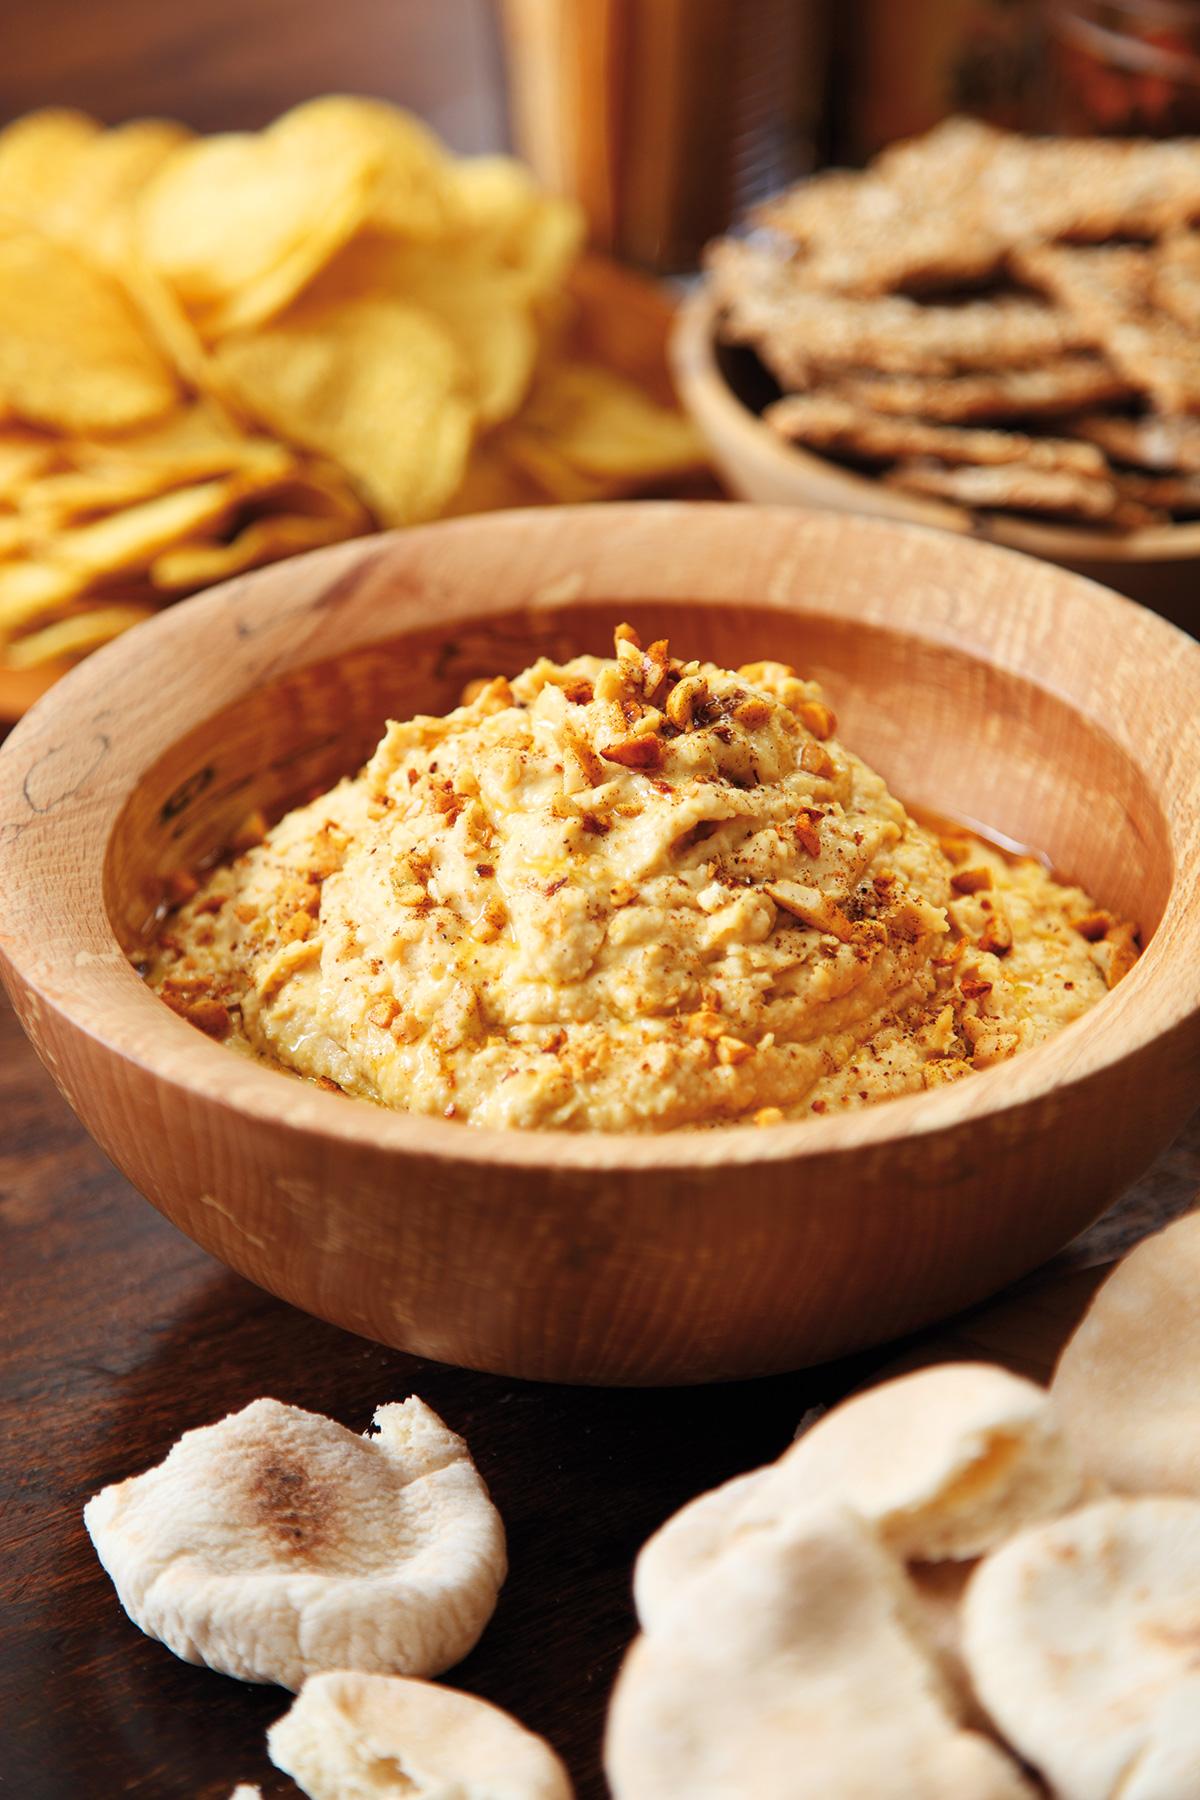 Peanut butter hummus 563a72112fcc8